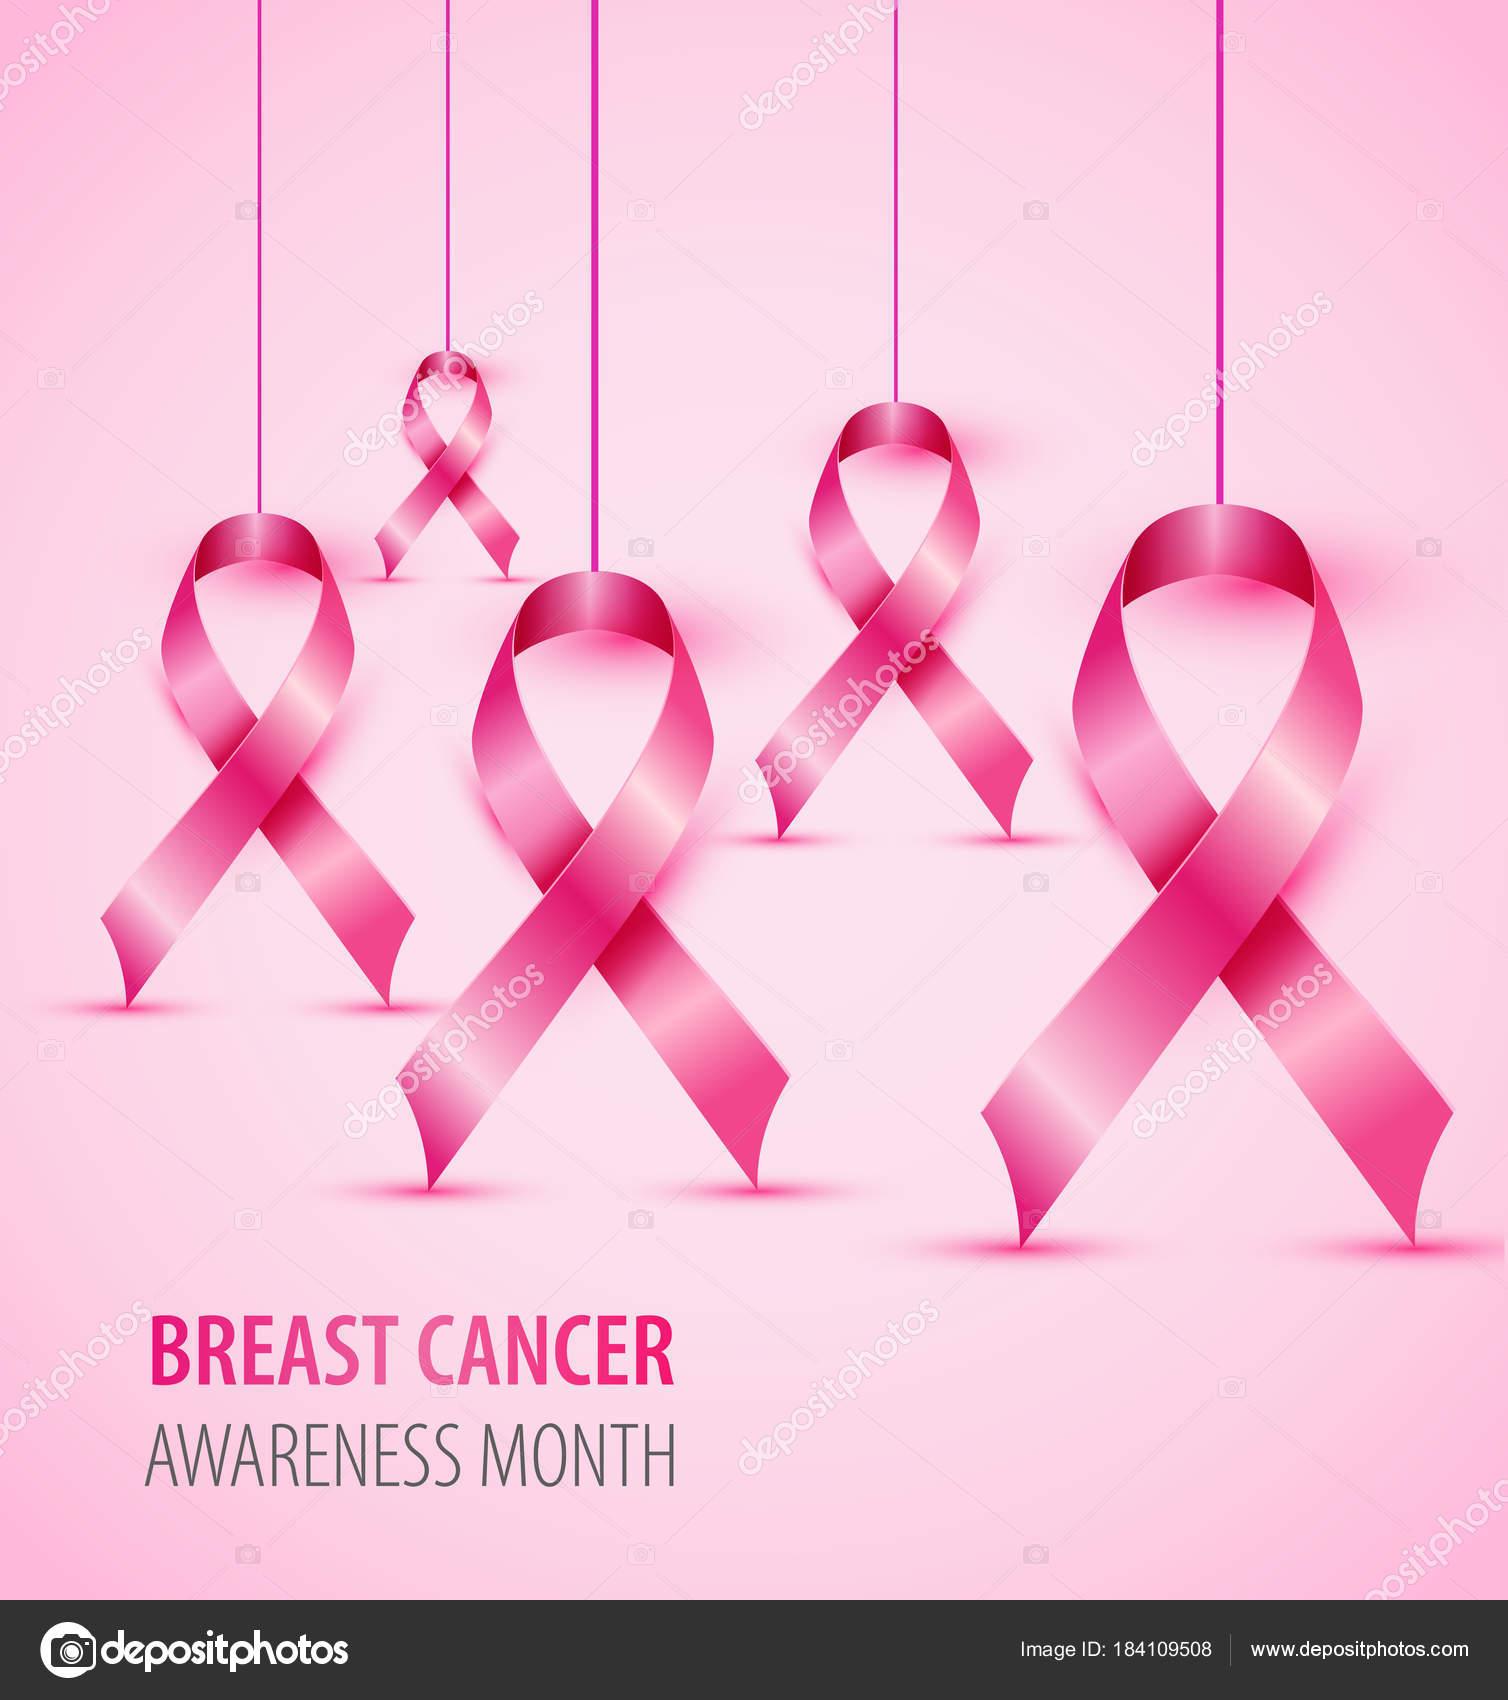 Breast Cancer Awareness Concept Illustration Pink Ribbon Symbol